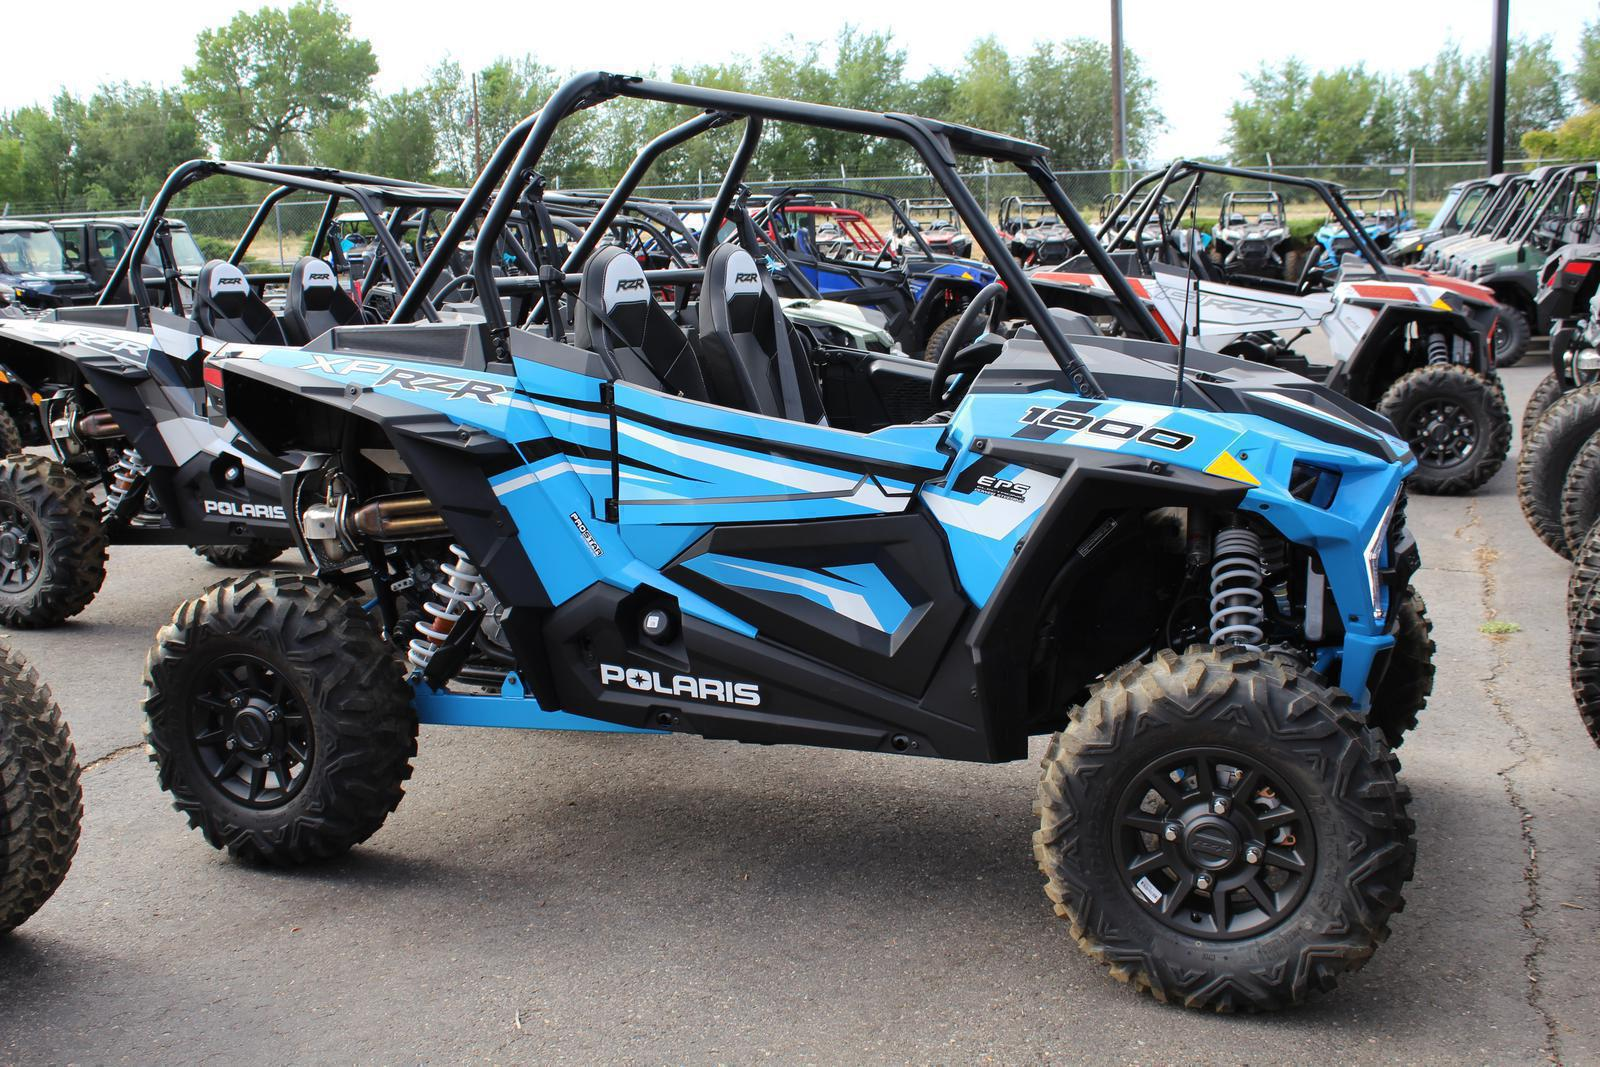 2019 Polaris Industries RZR XP® 1000 Ride Command - Sky Blue